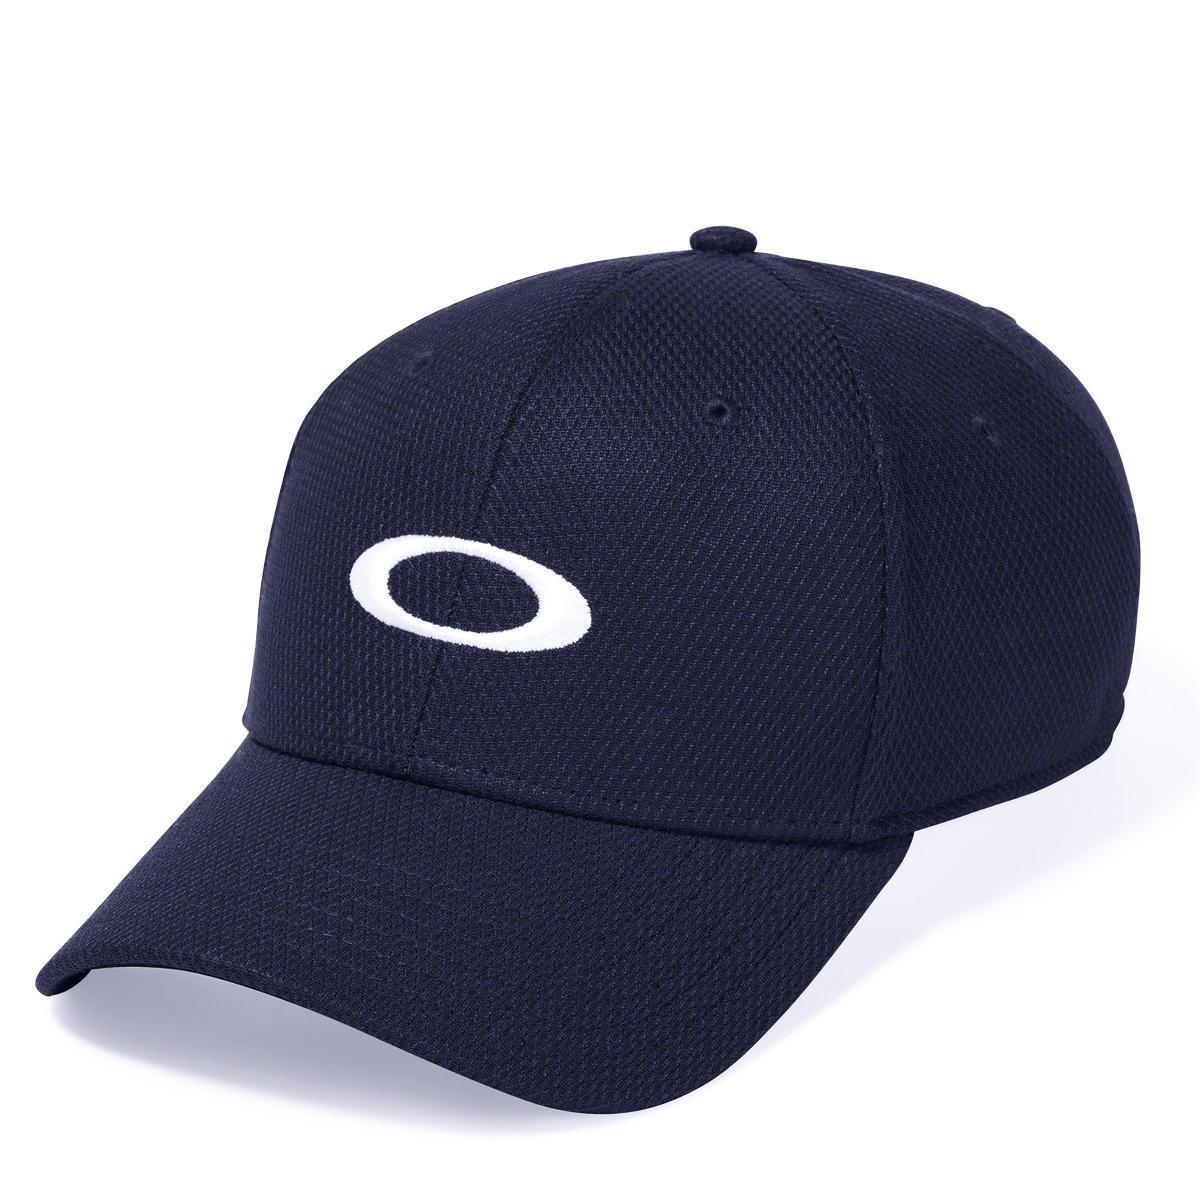 Boné Oakley Golf Ellipse Hidrolix - Azul - Compre Agora  9c29d28bdf2